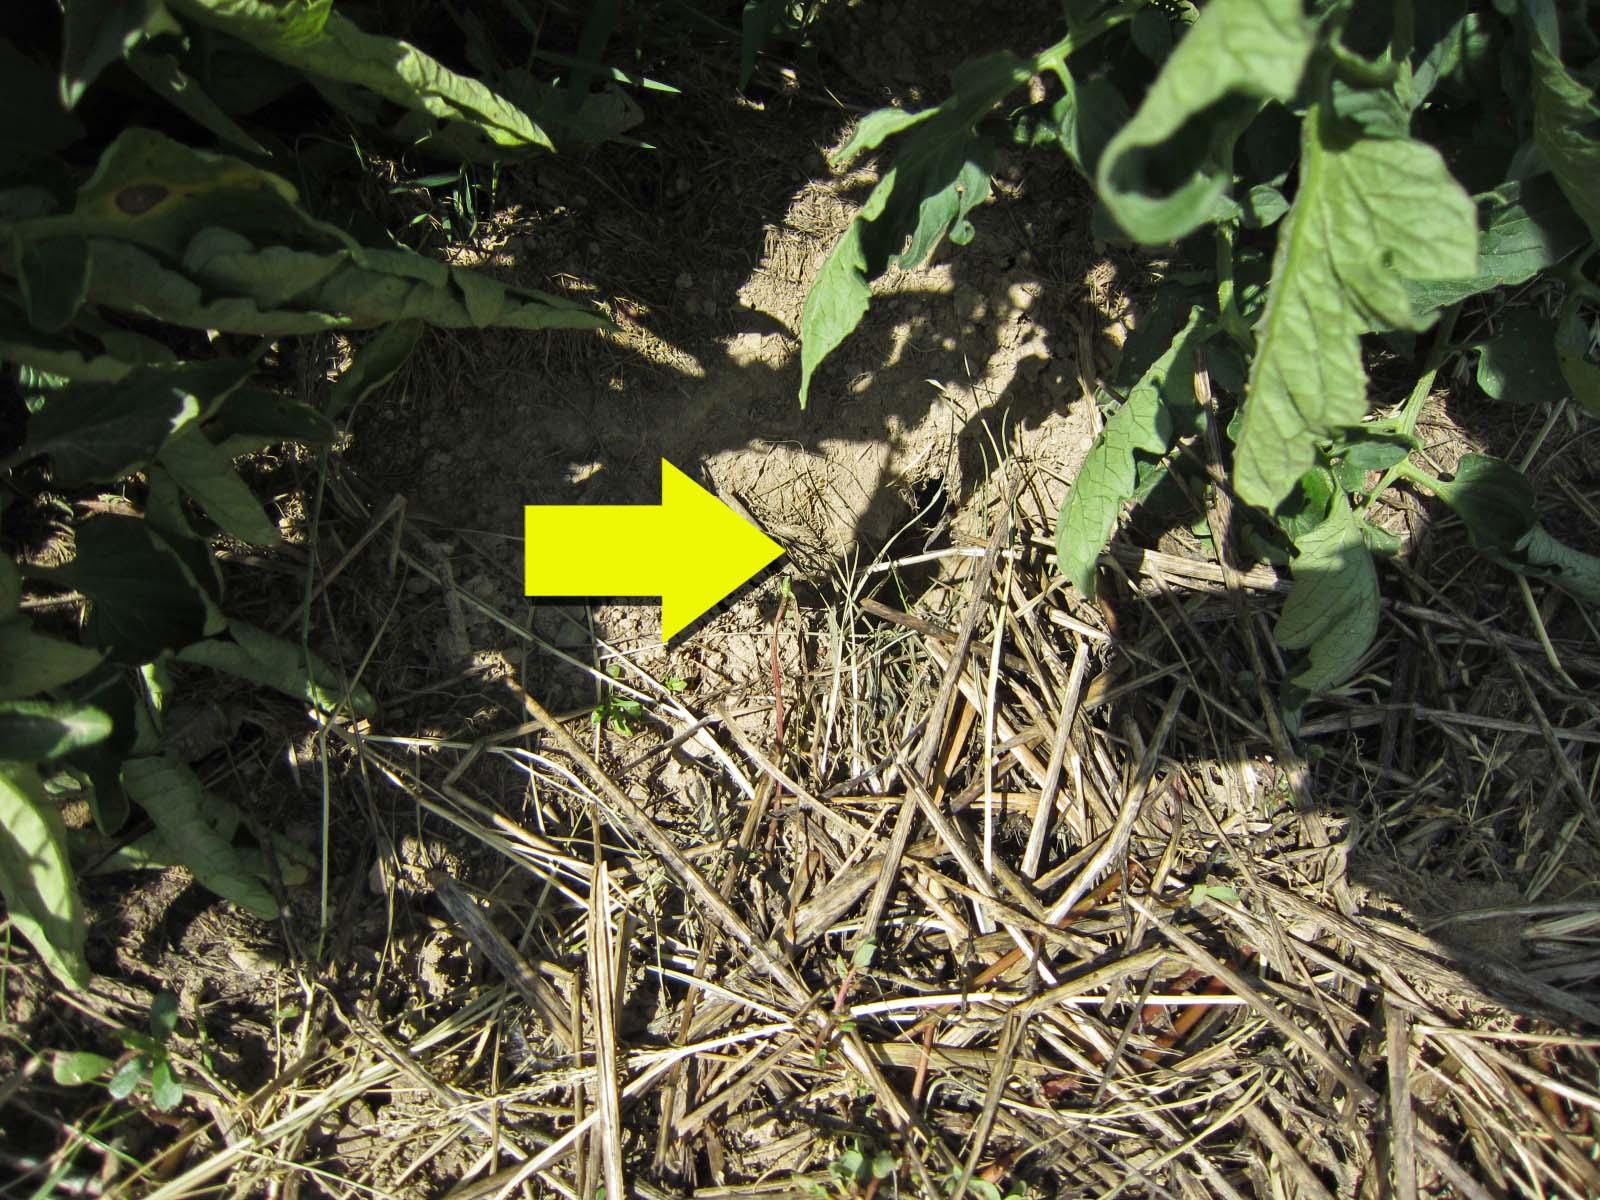 Bunny hole dug into garden